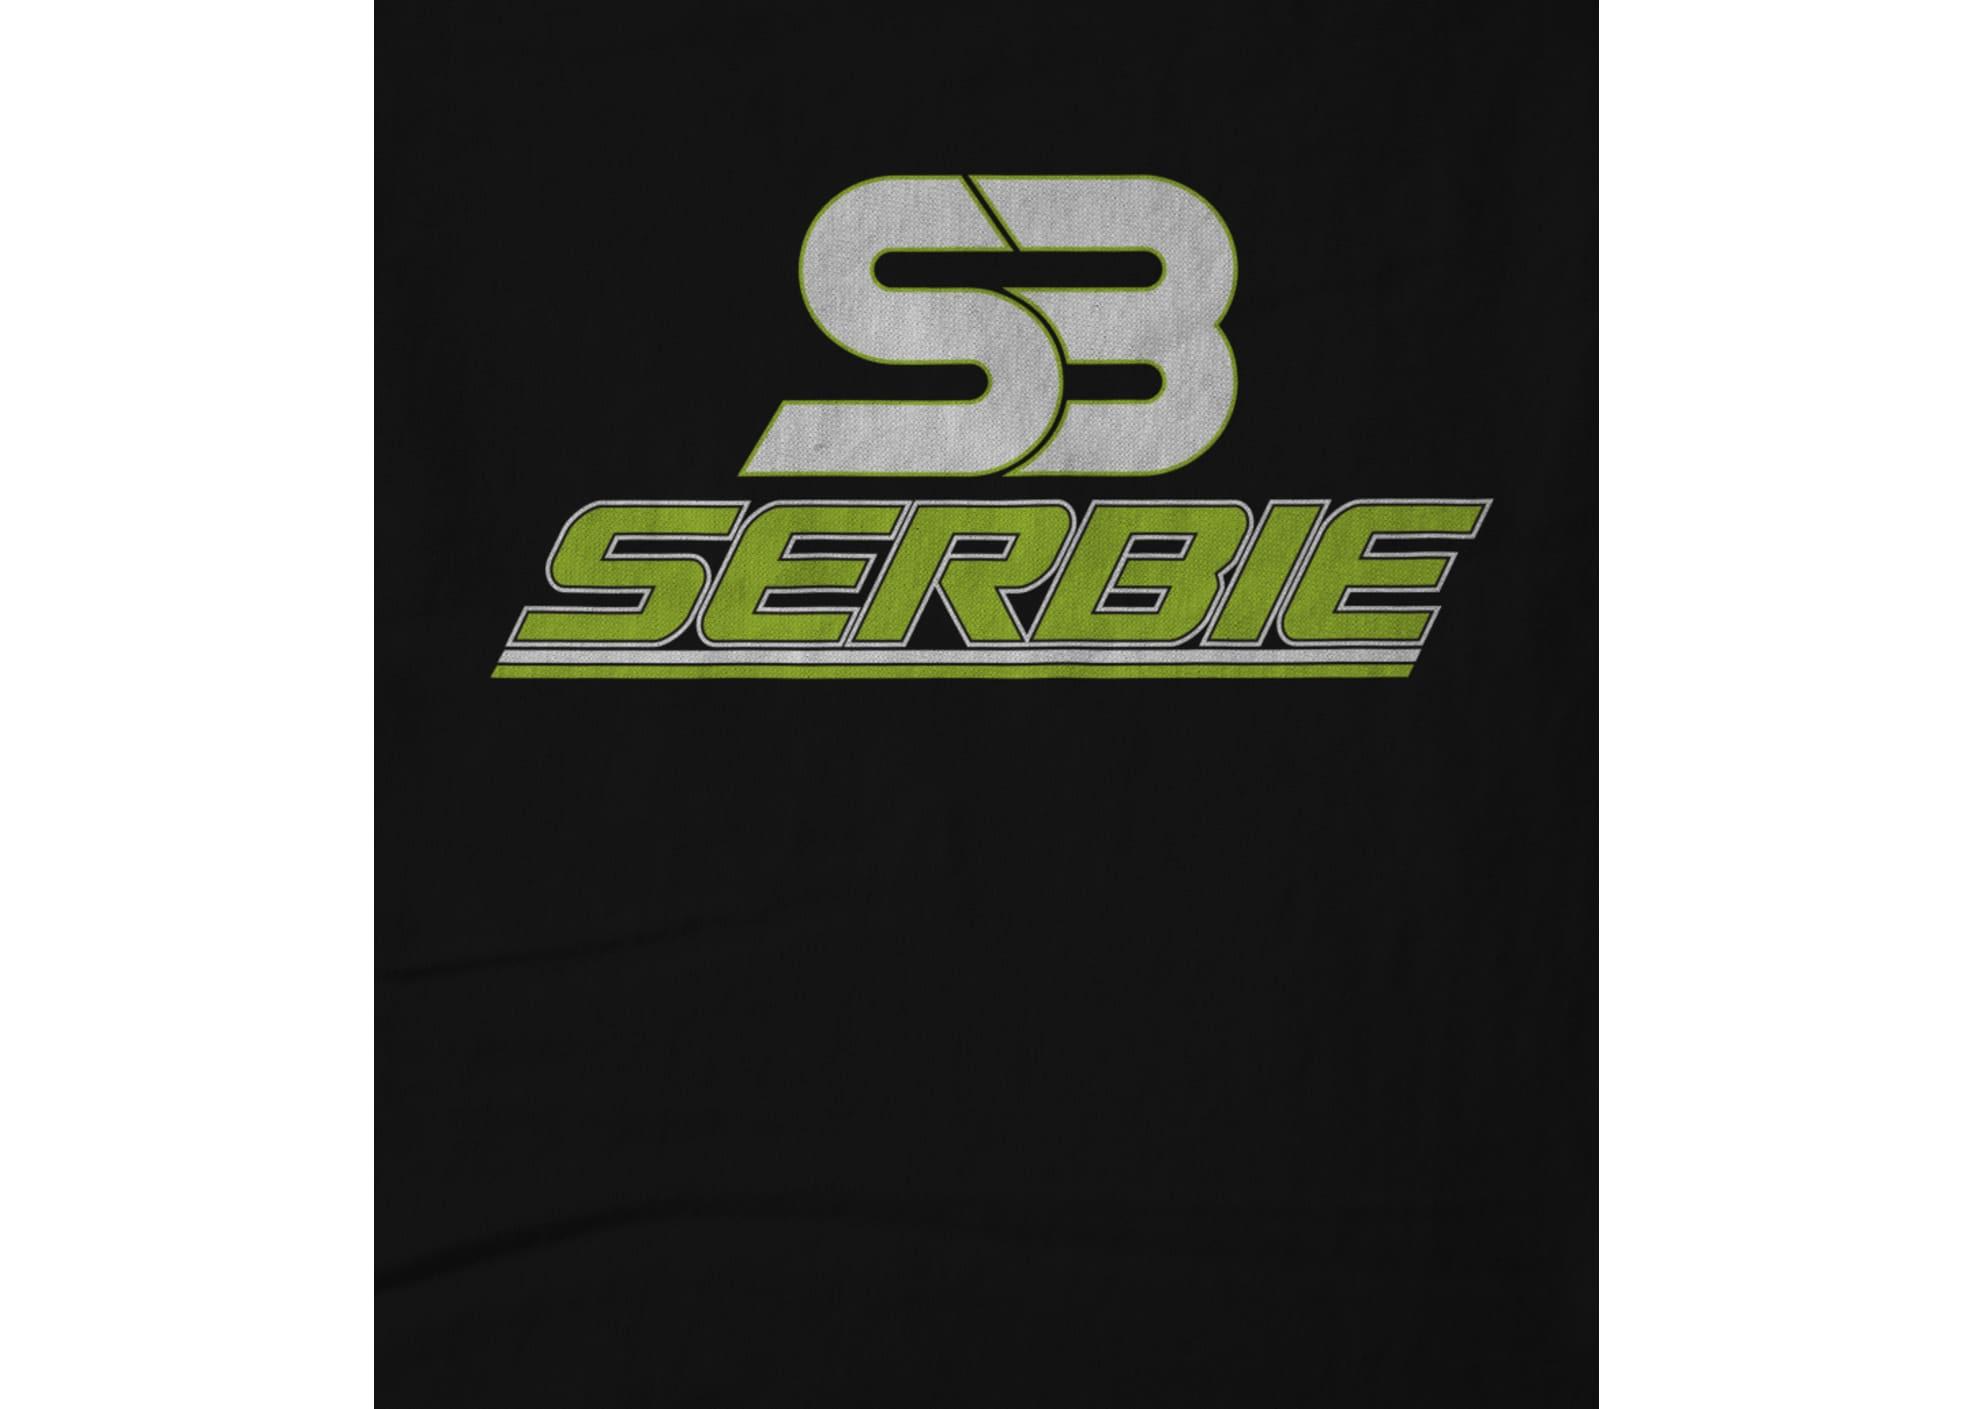 Serbie serbielogo1 1592771191